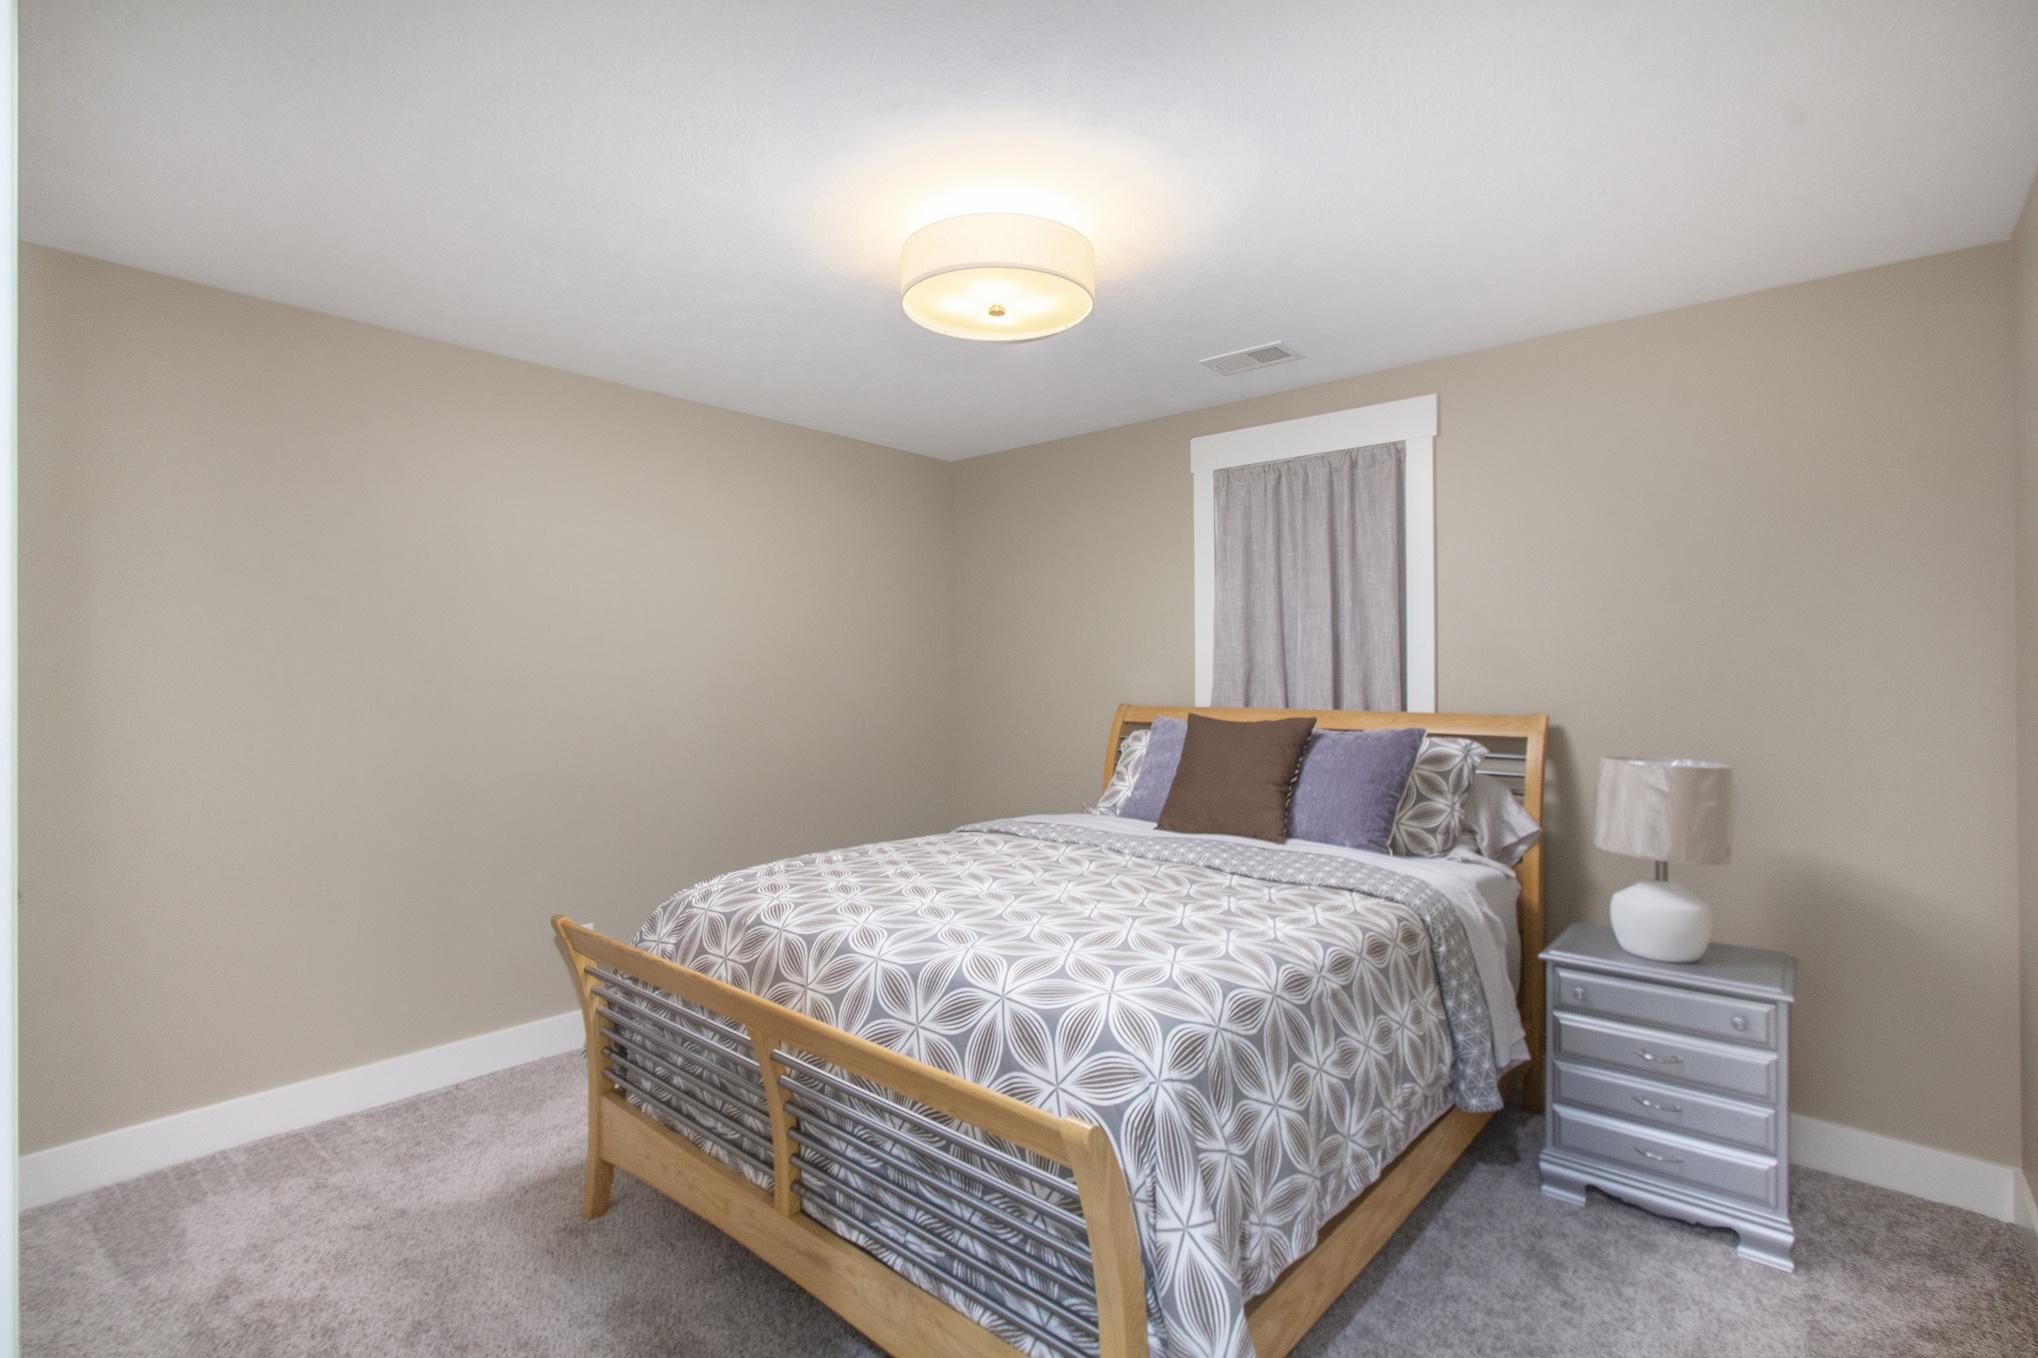 Custom Home Finished Basement Bedroom with Egress Window